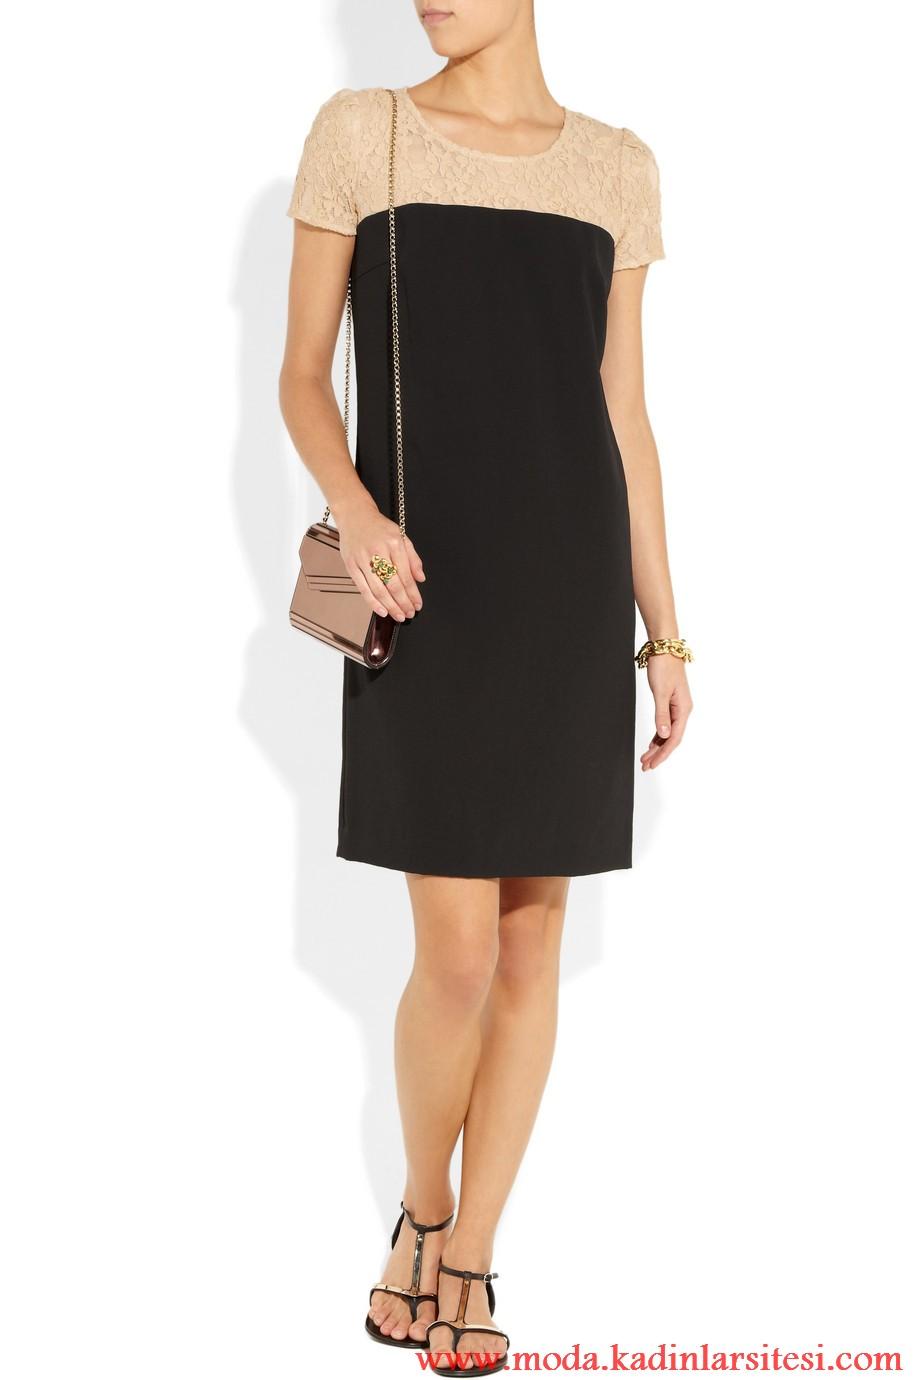 dkny krem siyah elbise modeli